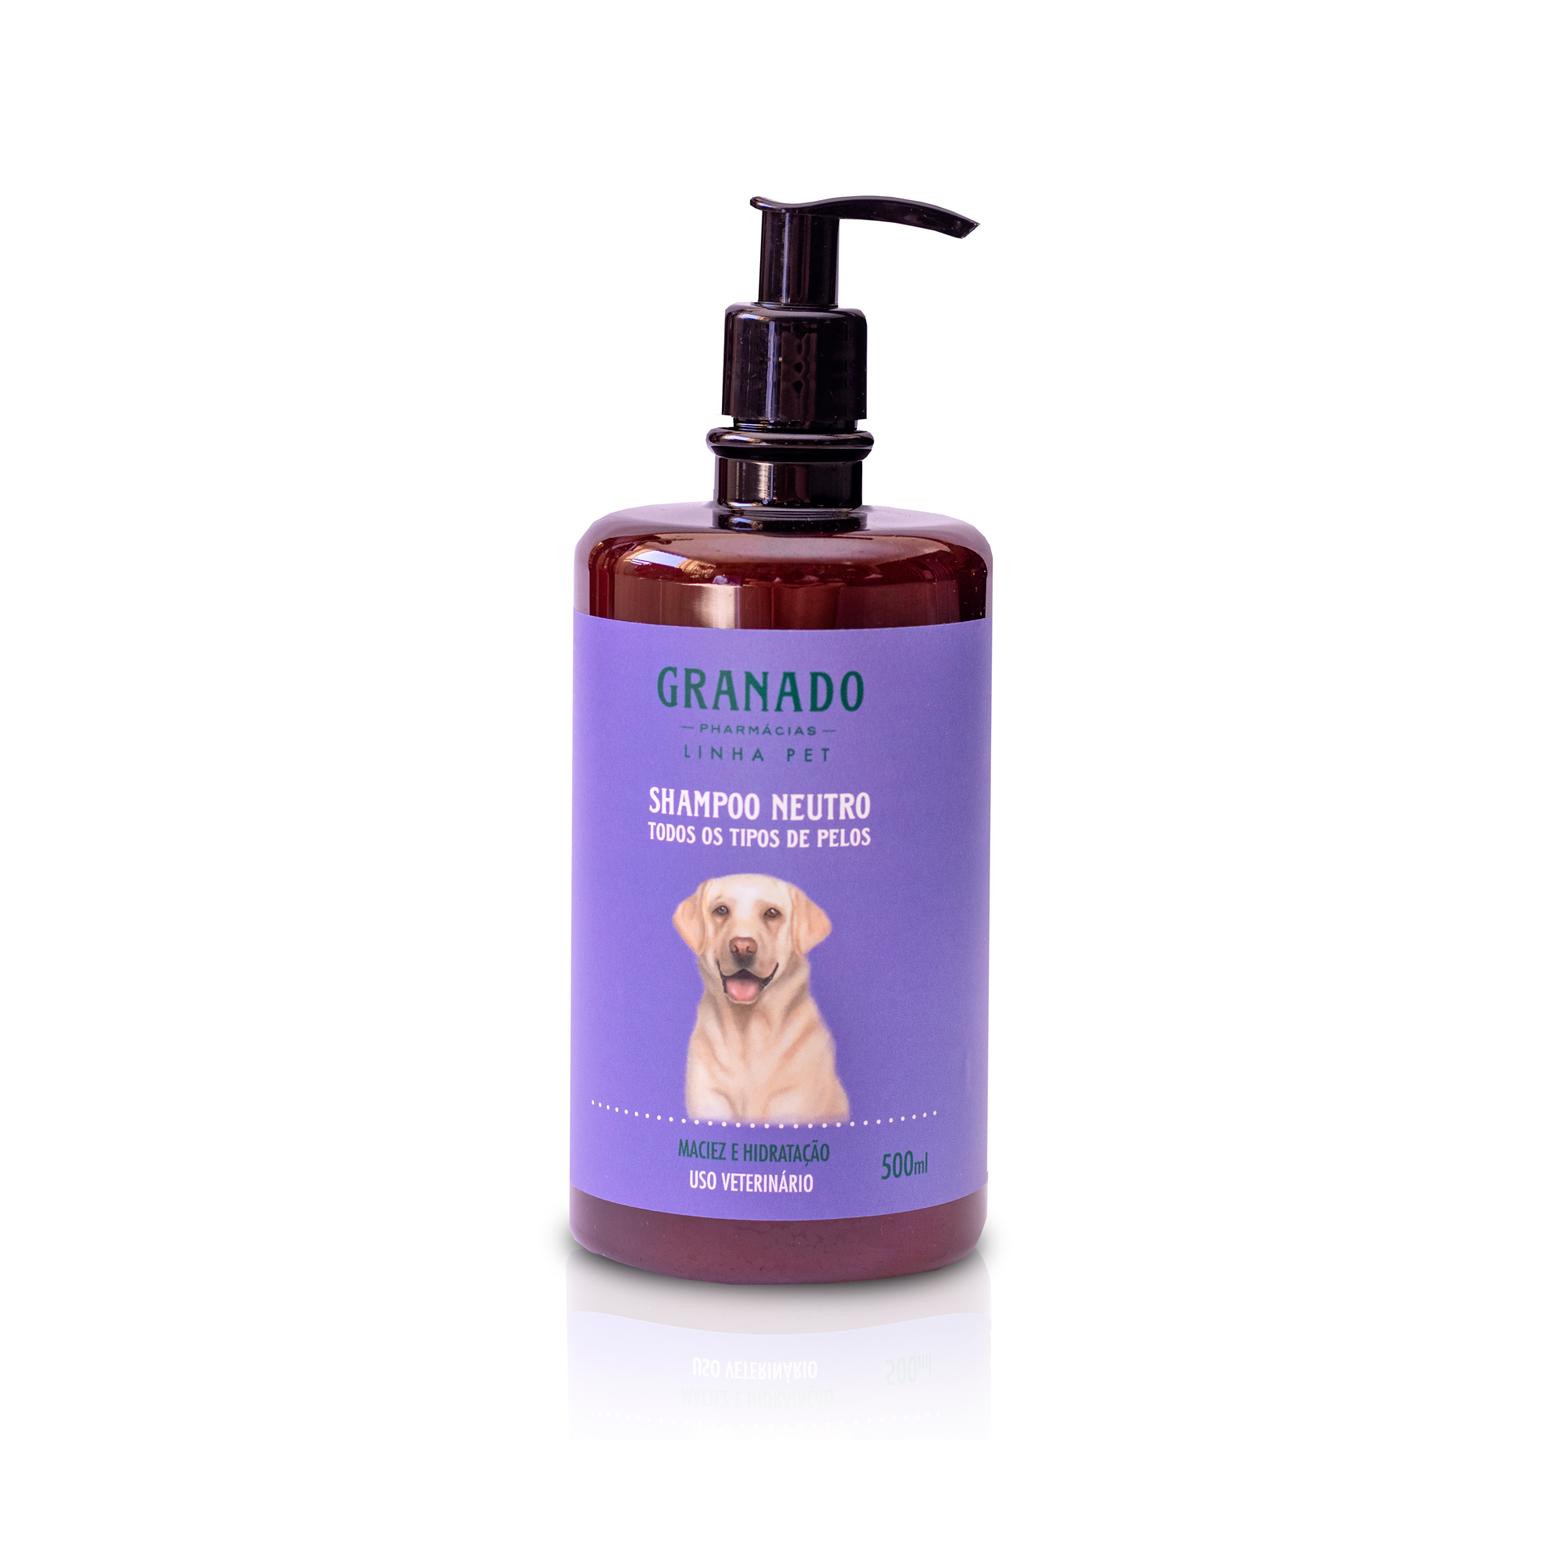 Shampoo Neutro 500ml Granado